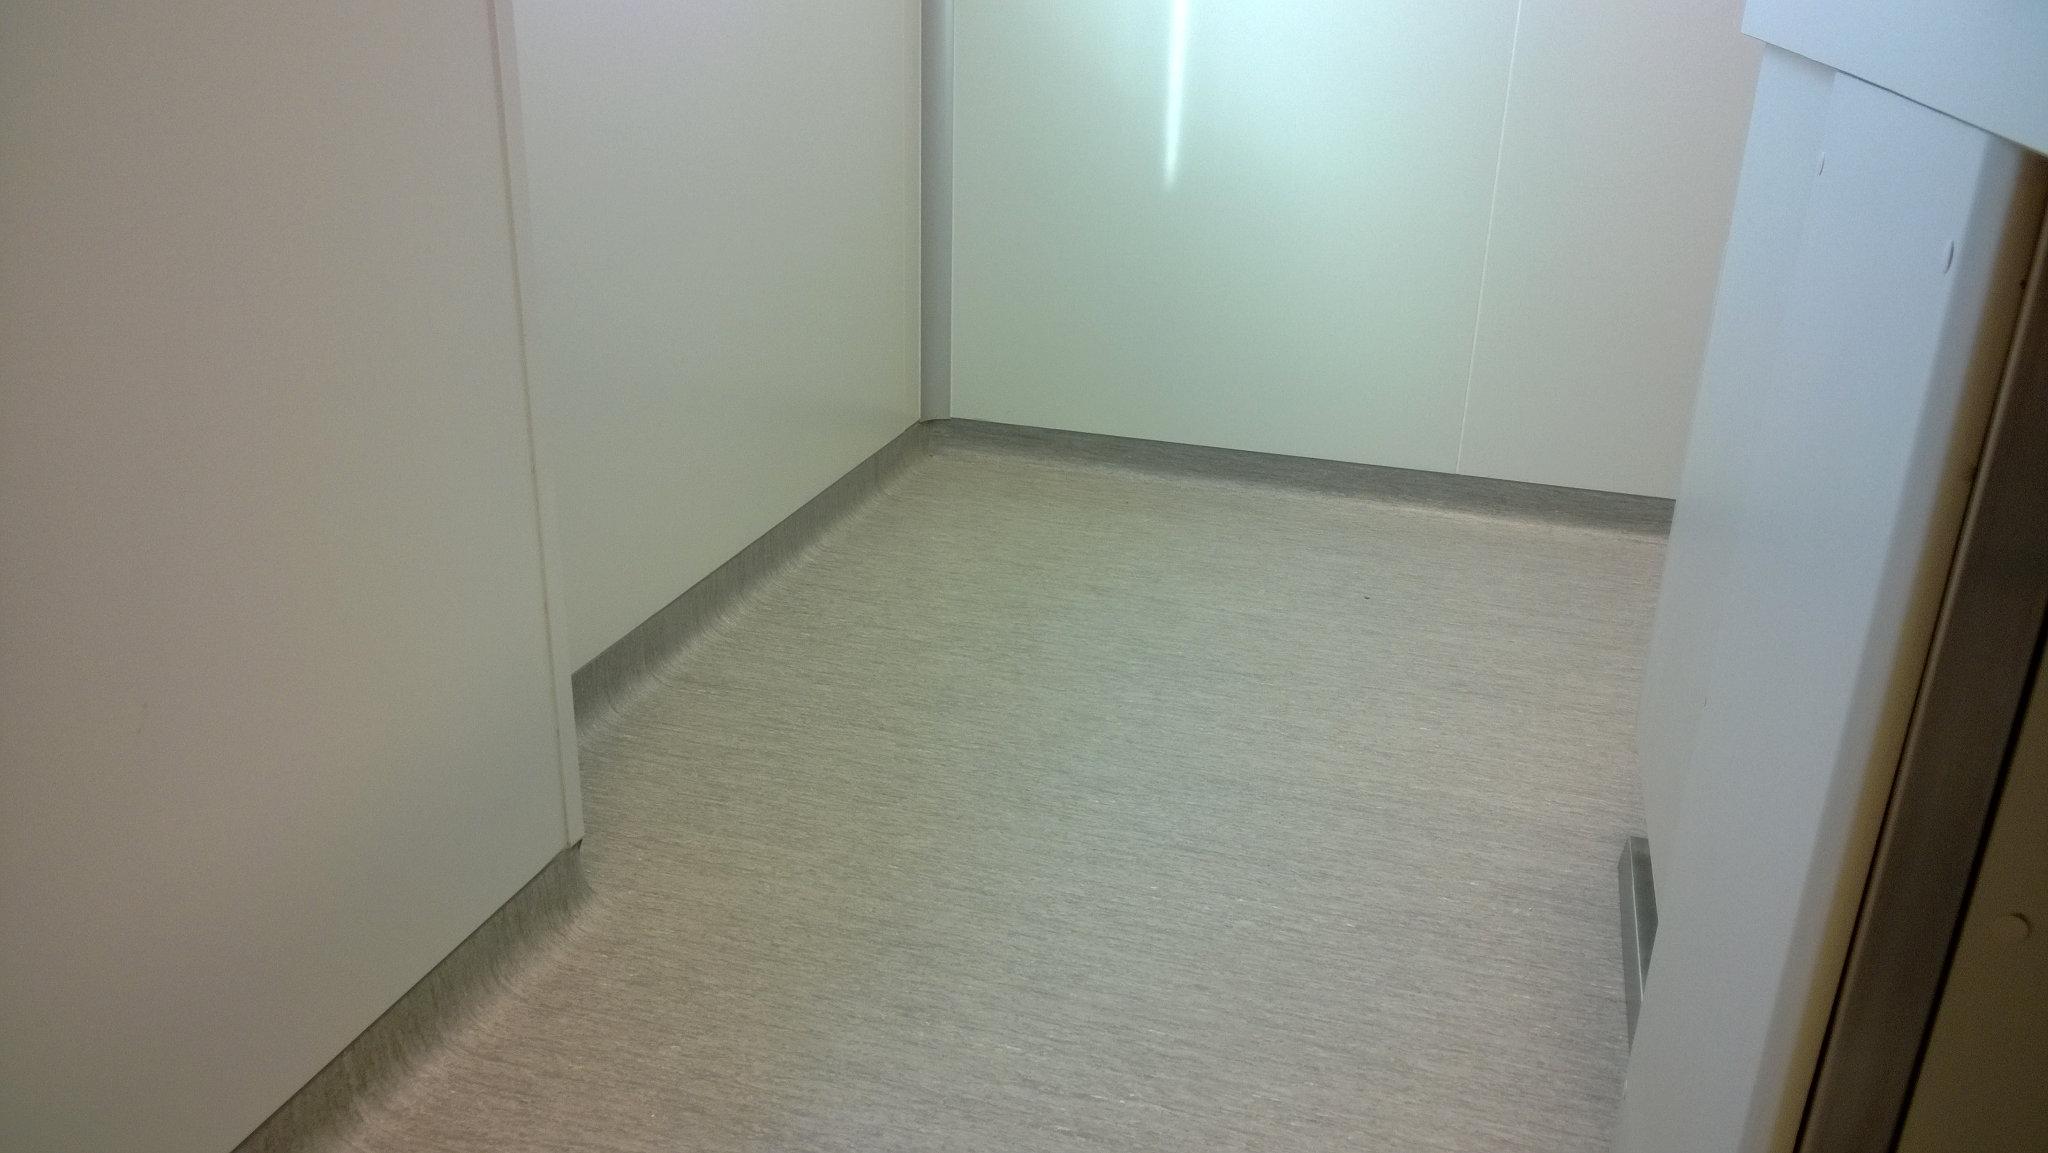 Suelo pvc autoadhesivo pavimentos arquiservi laboratorio - Instalar suelo vinilico autoadhesivo ...